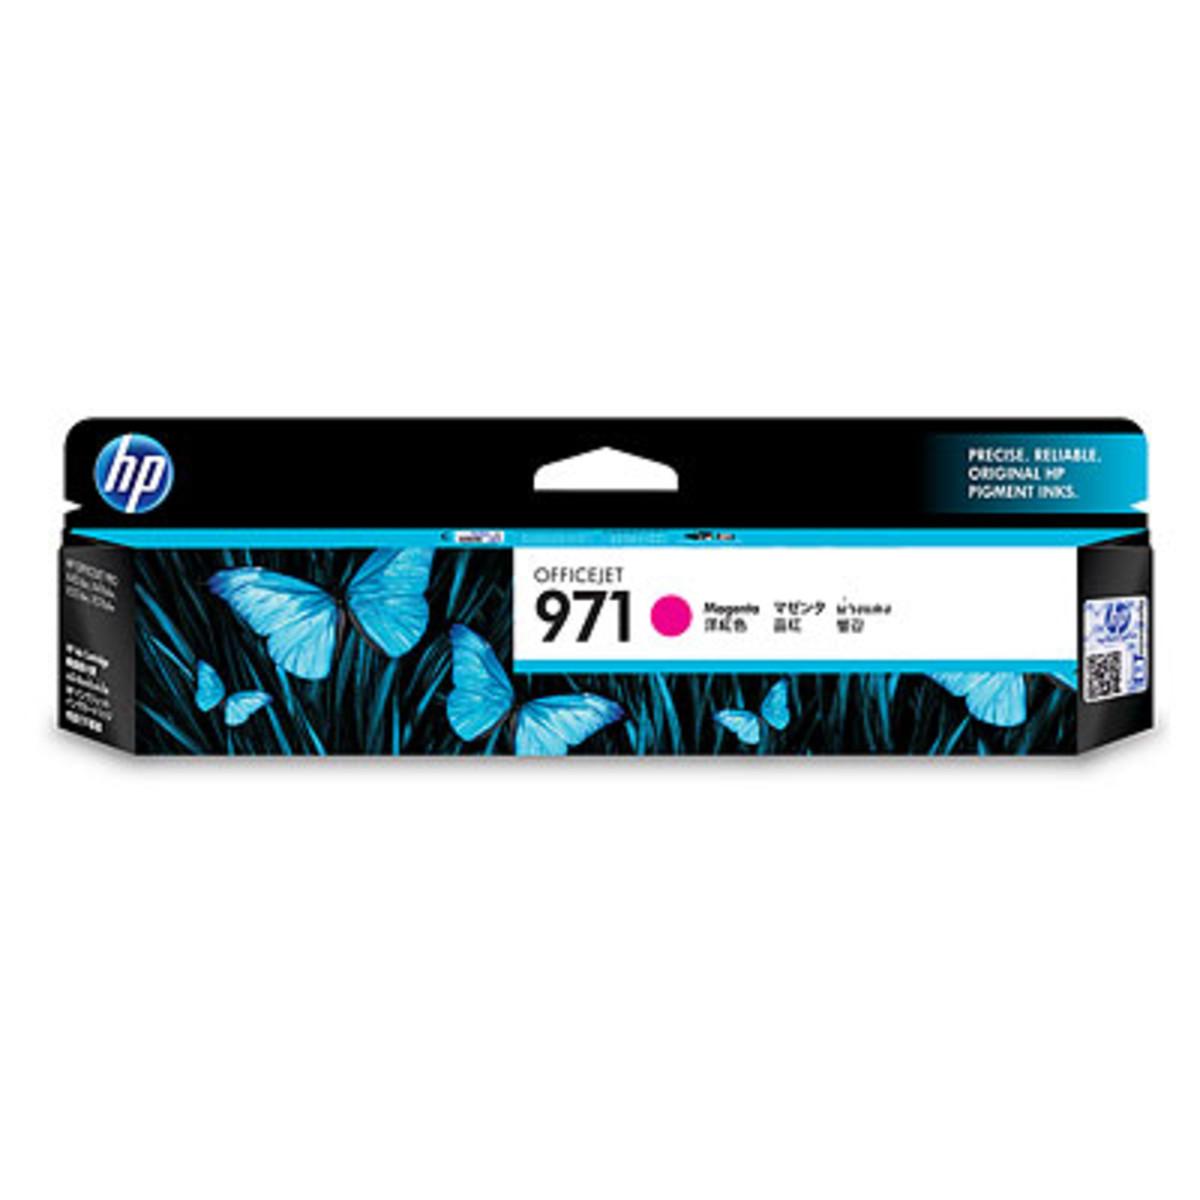 HP 971 (CN623AA) Magenta Ink Cartridge